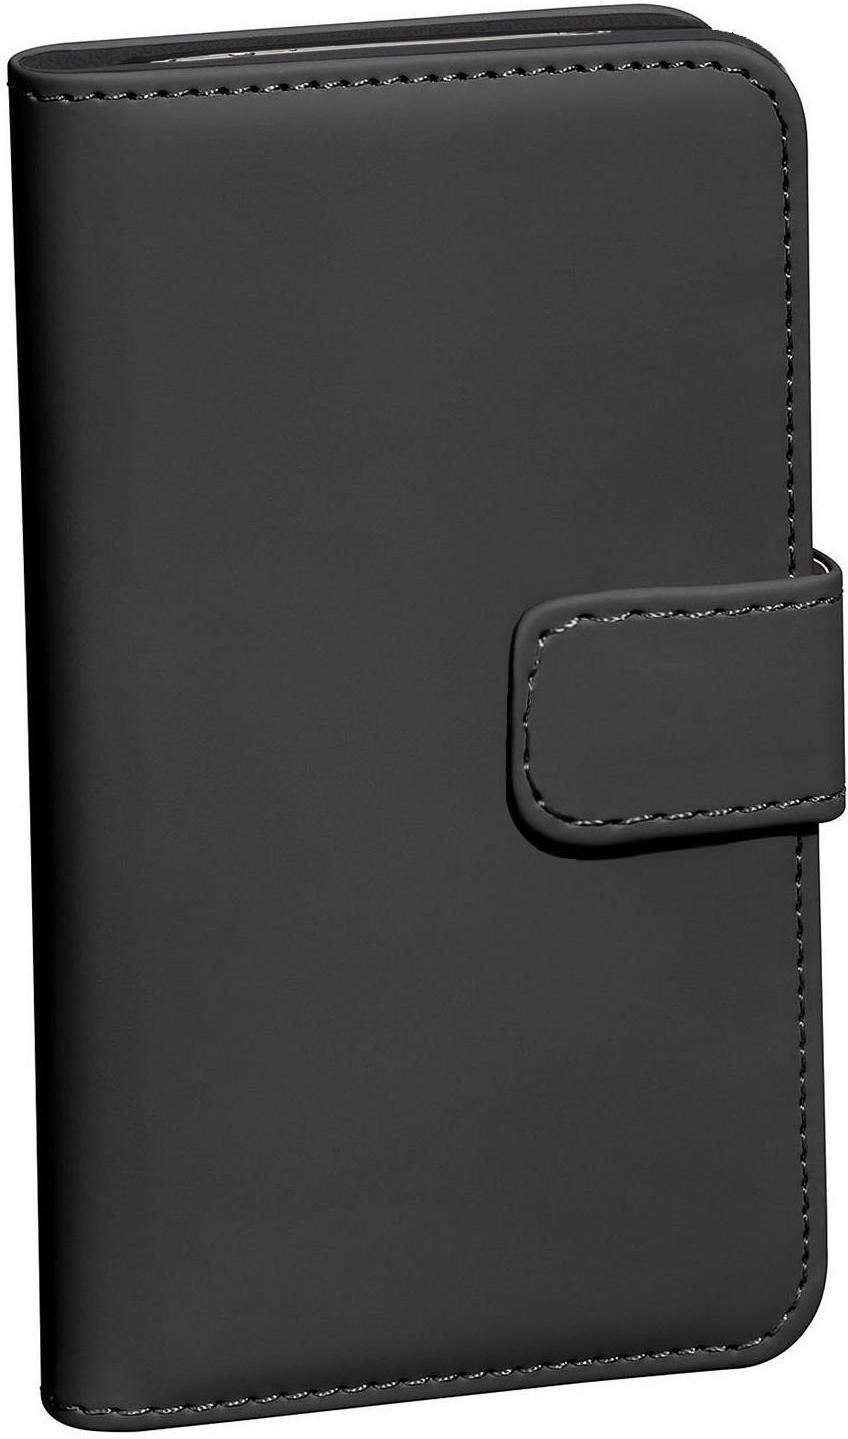 Image of PEDEA Book Cover Classic for Huawei P8 Lite 2017, black